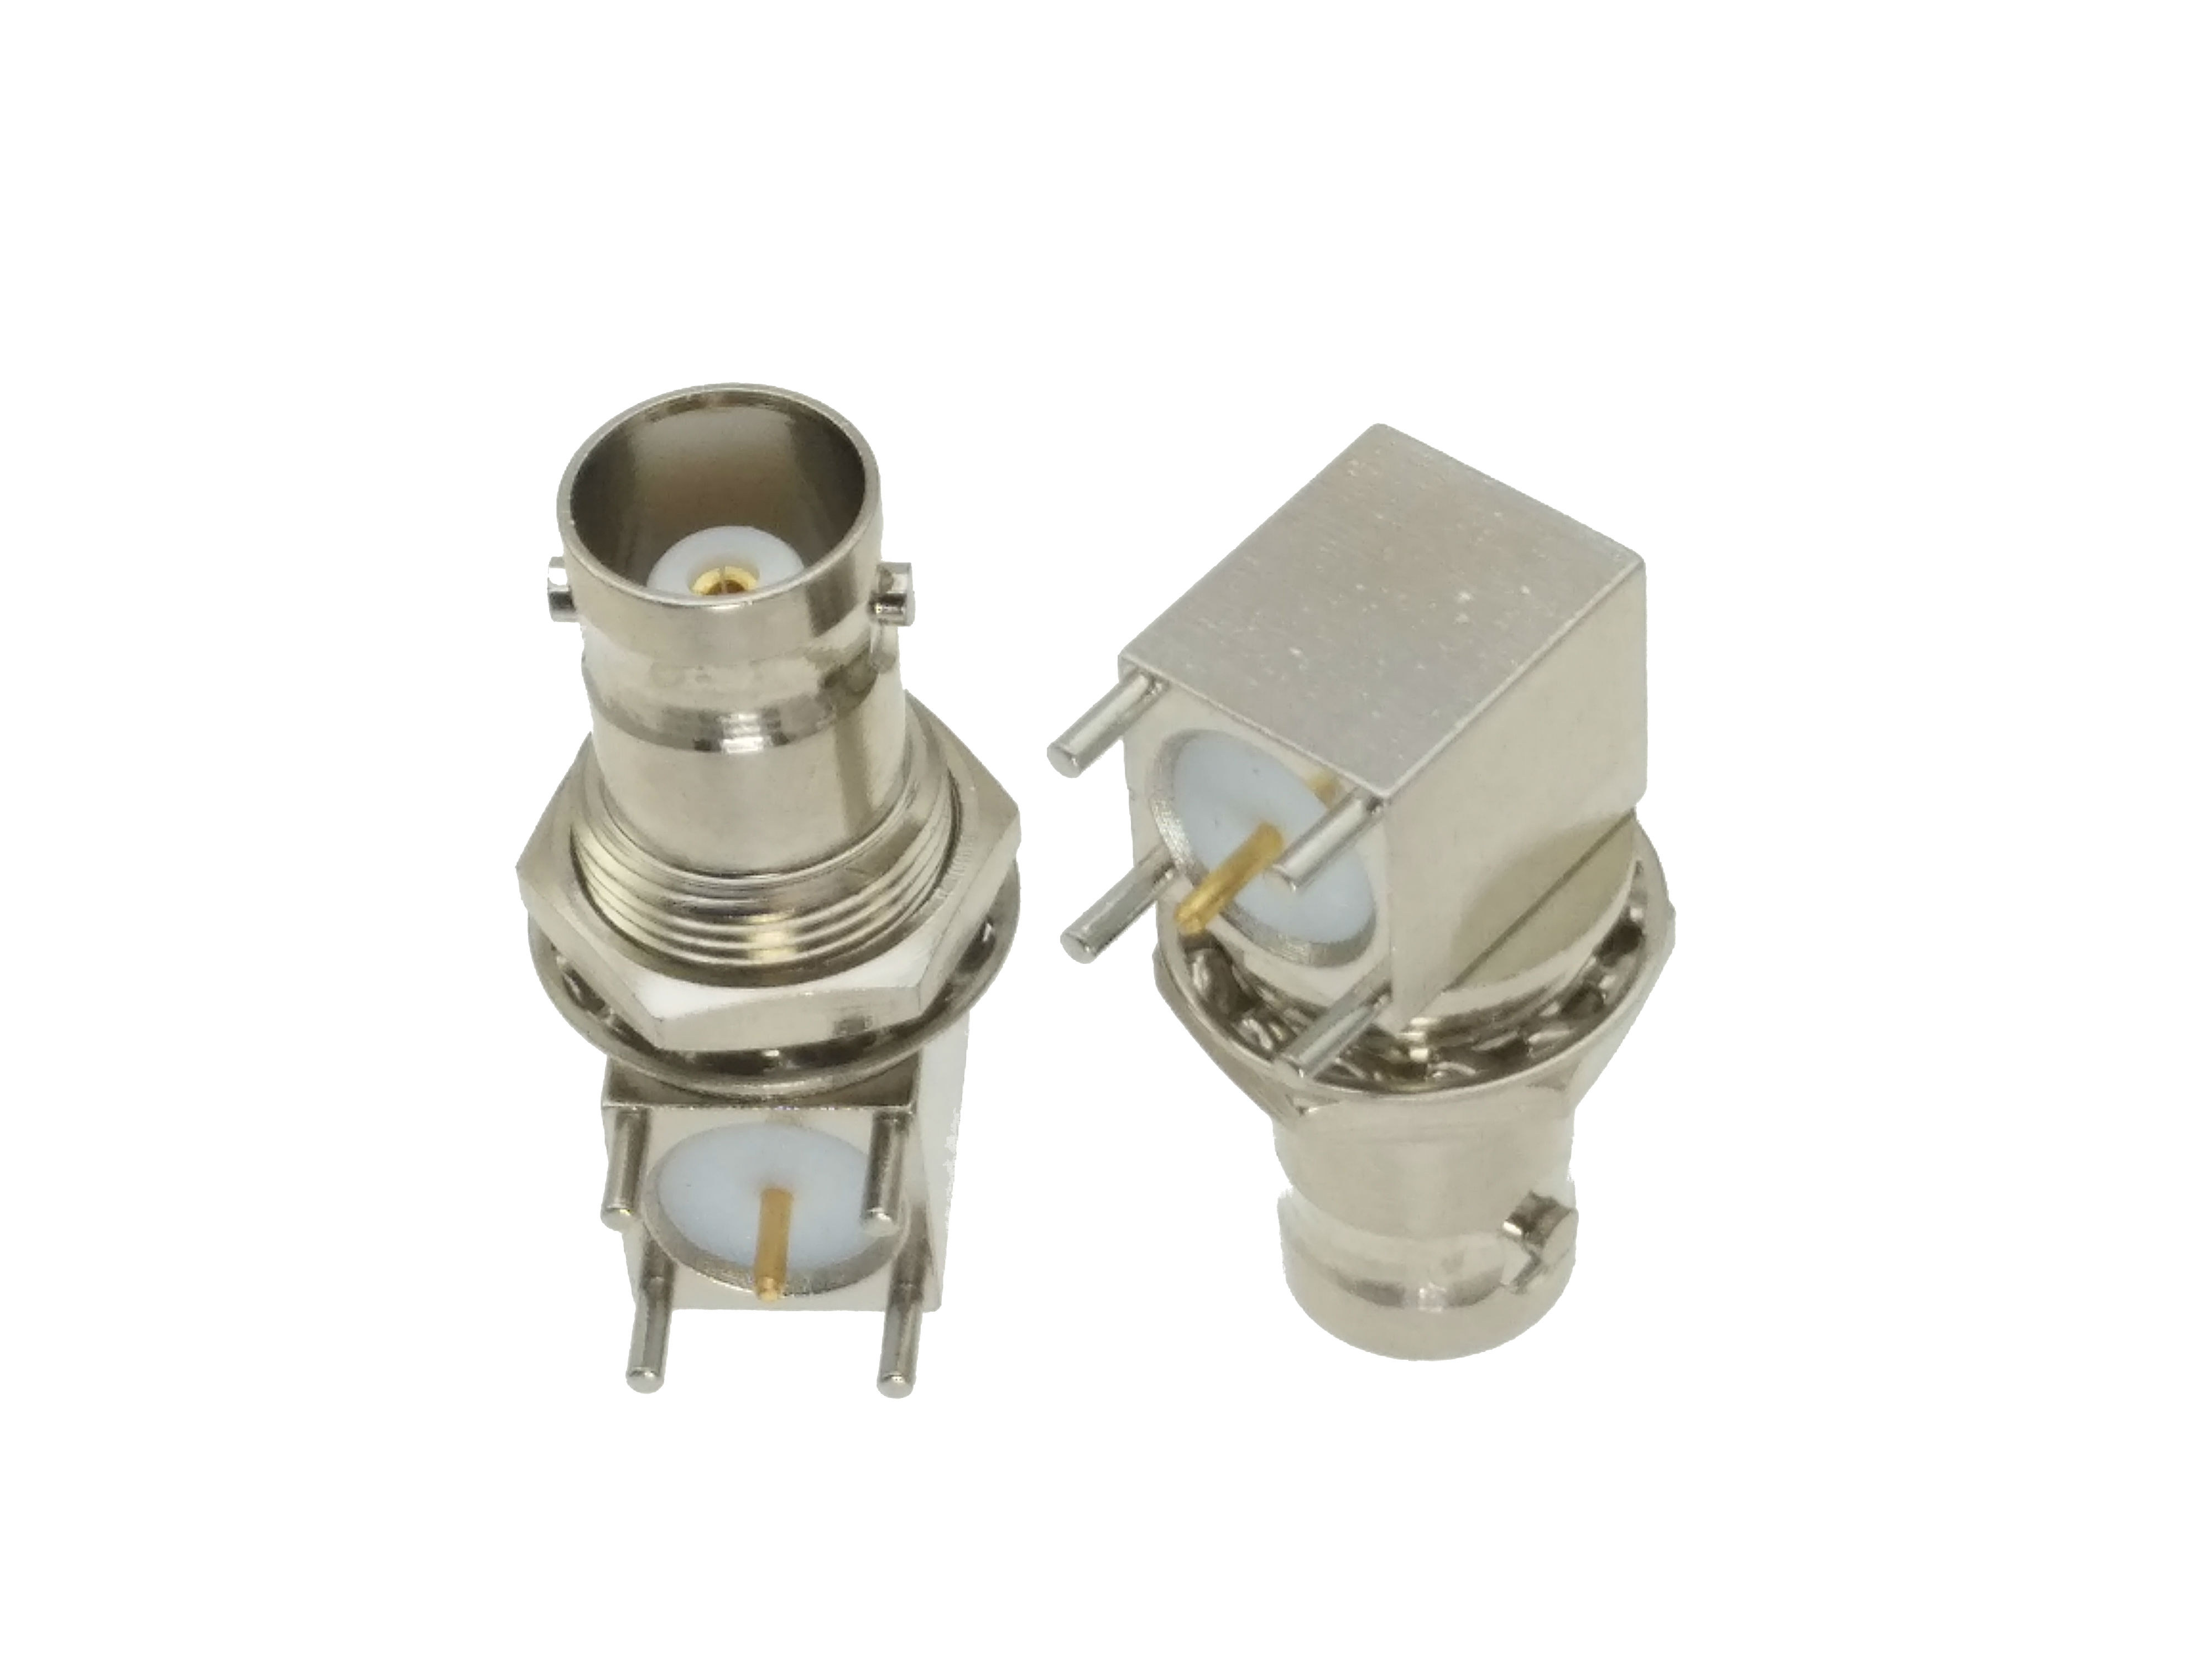 10pcs Connector BNC Female Jack Nut Bulkhead Right Angle Solder PCB Mount F